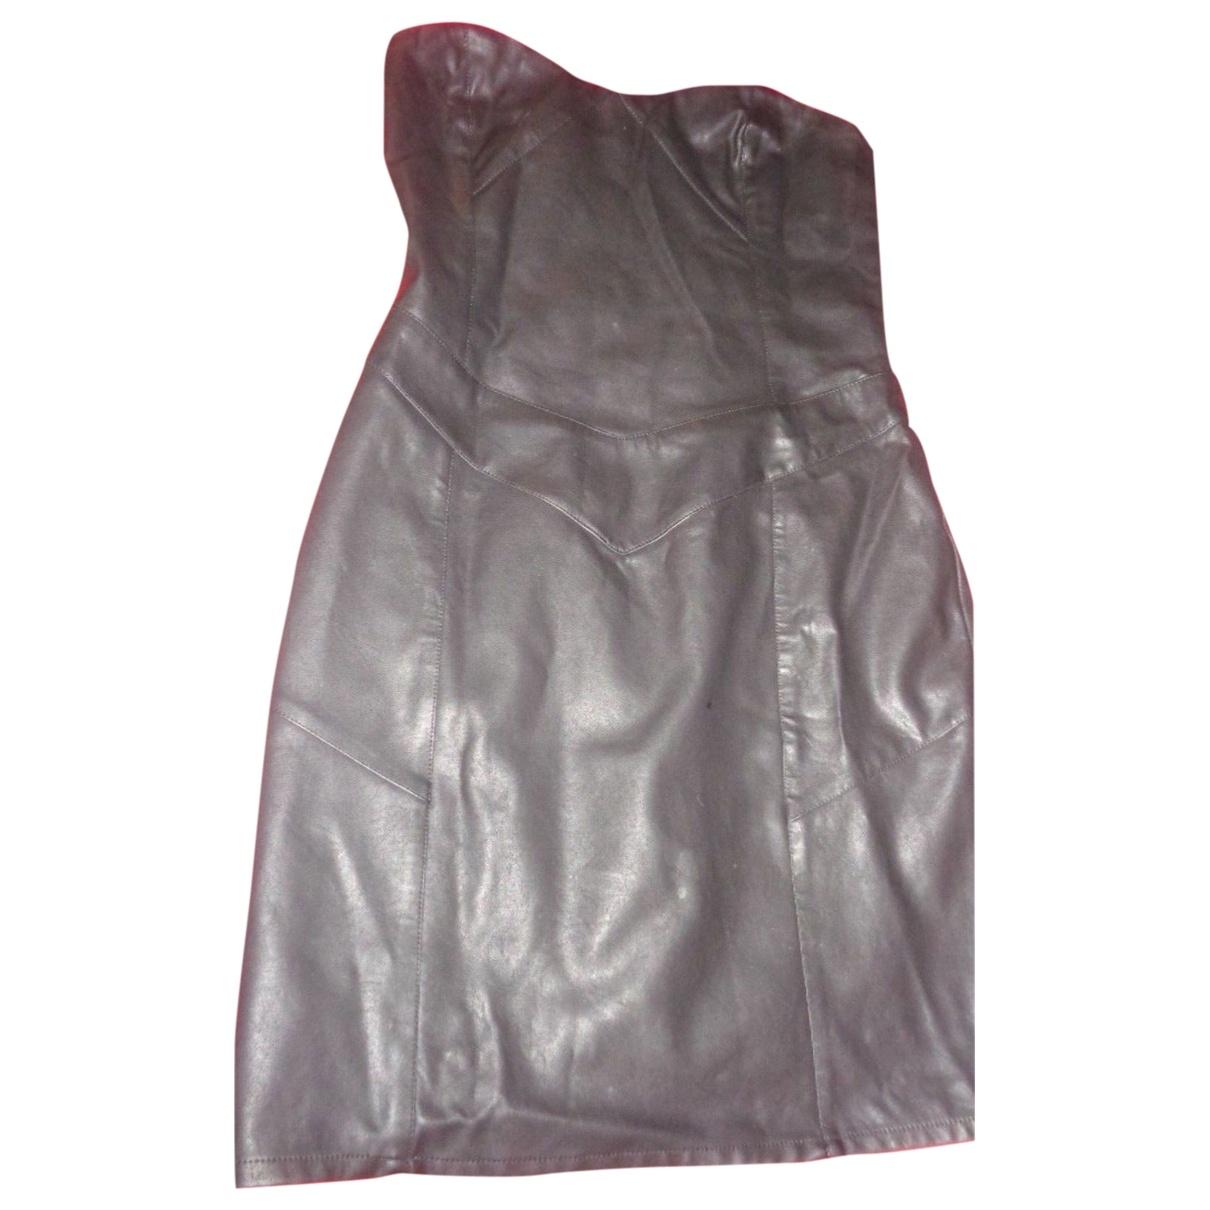 Vestido en Sintetico Negro Non Signe / Unsigned